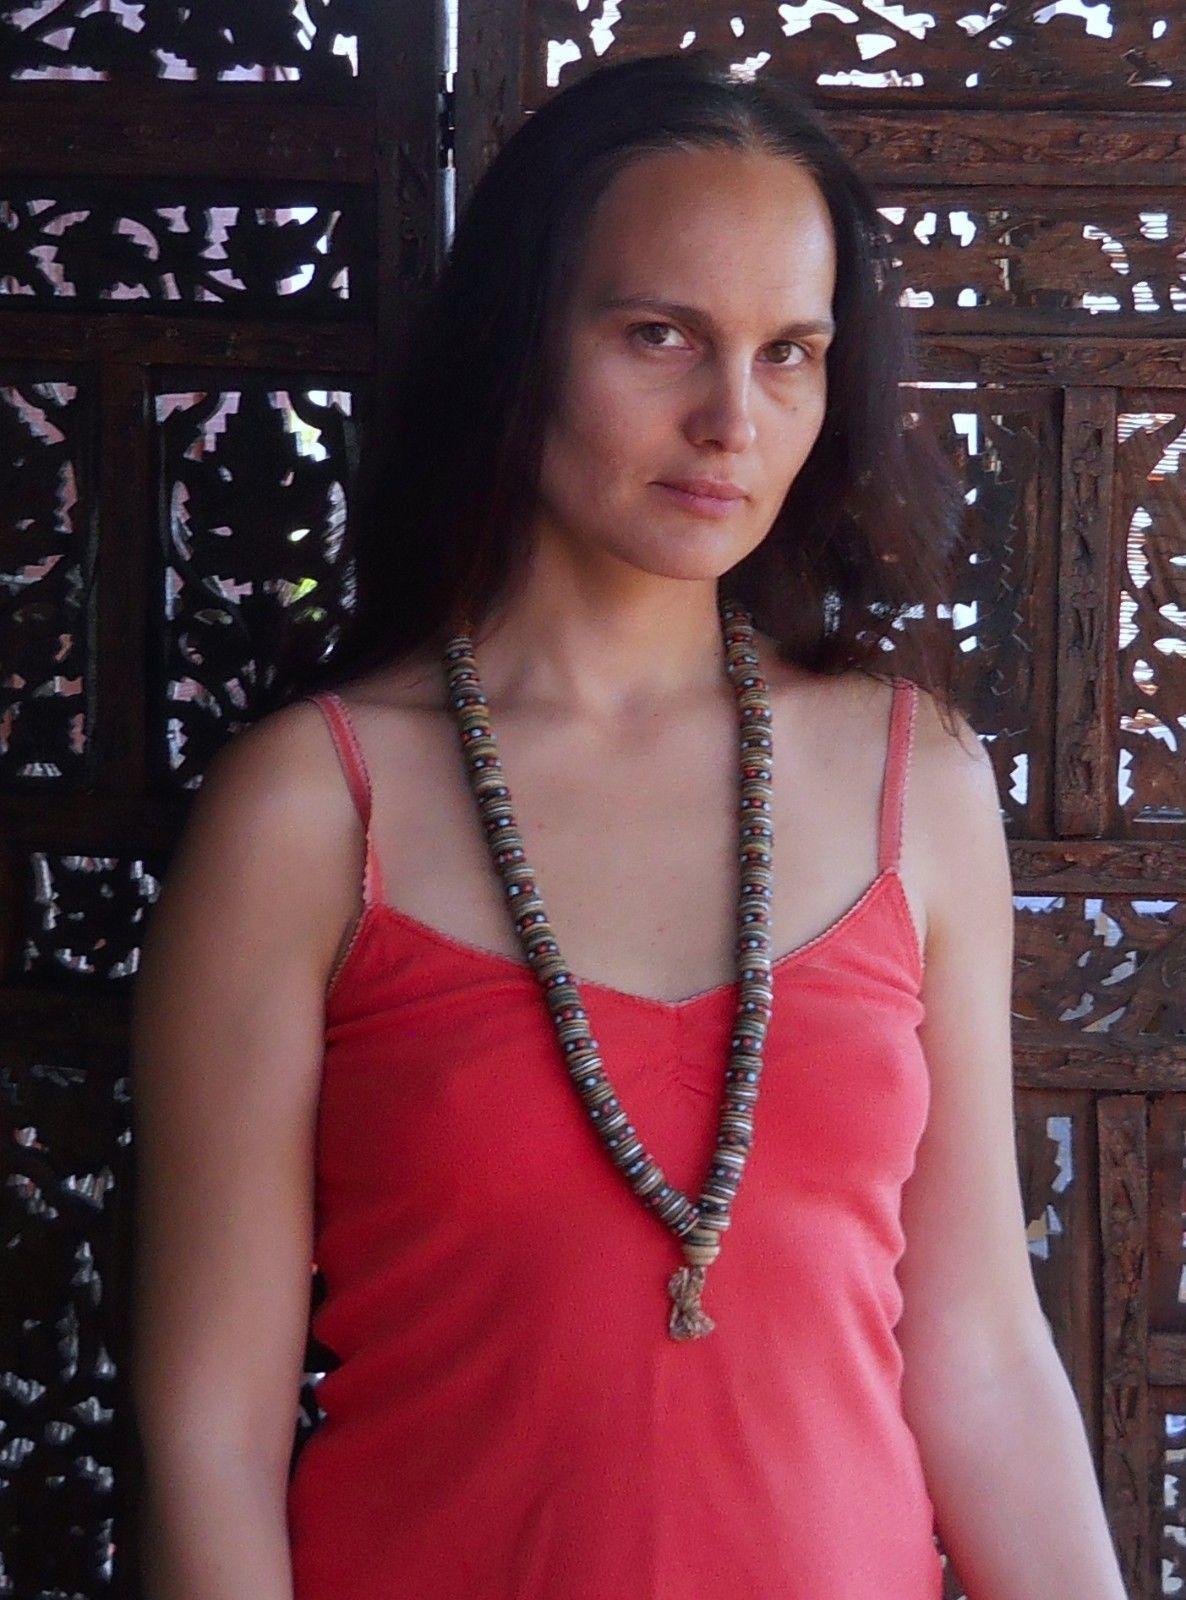 Tibetan Buddhist Yak Bone Coral & Turquoise Inlaid Healing Mala Meditation Beads